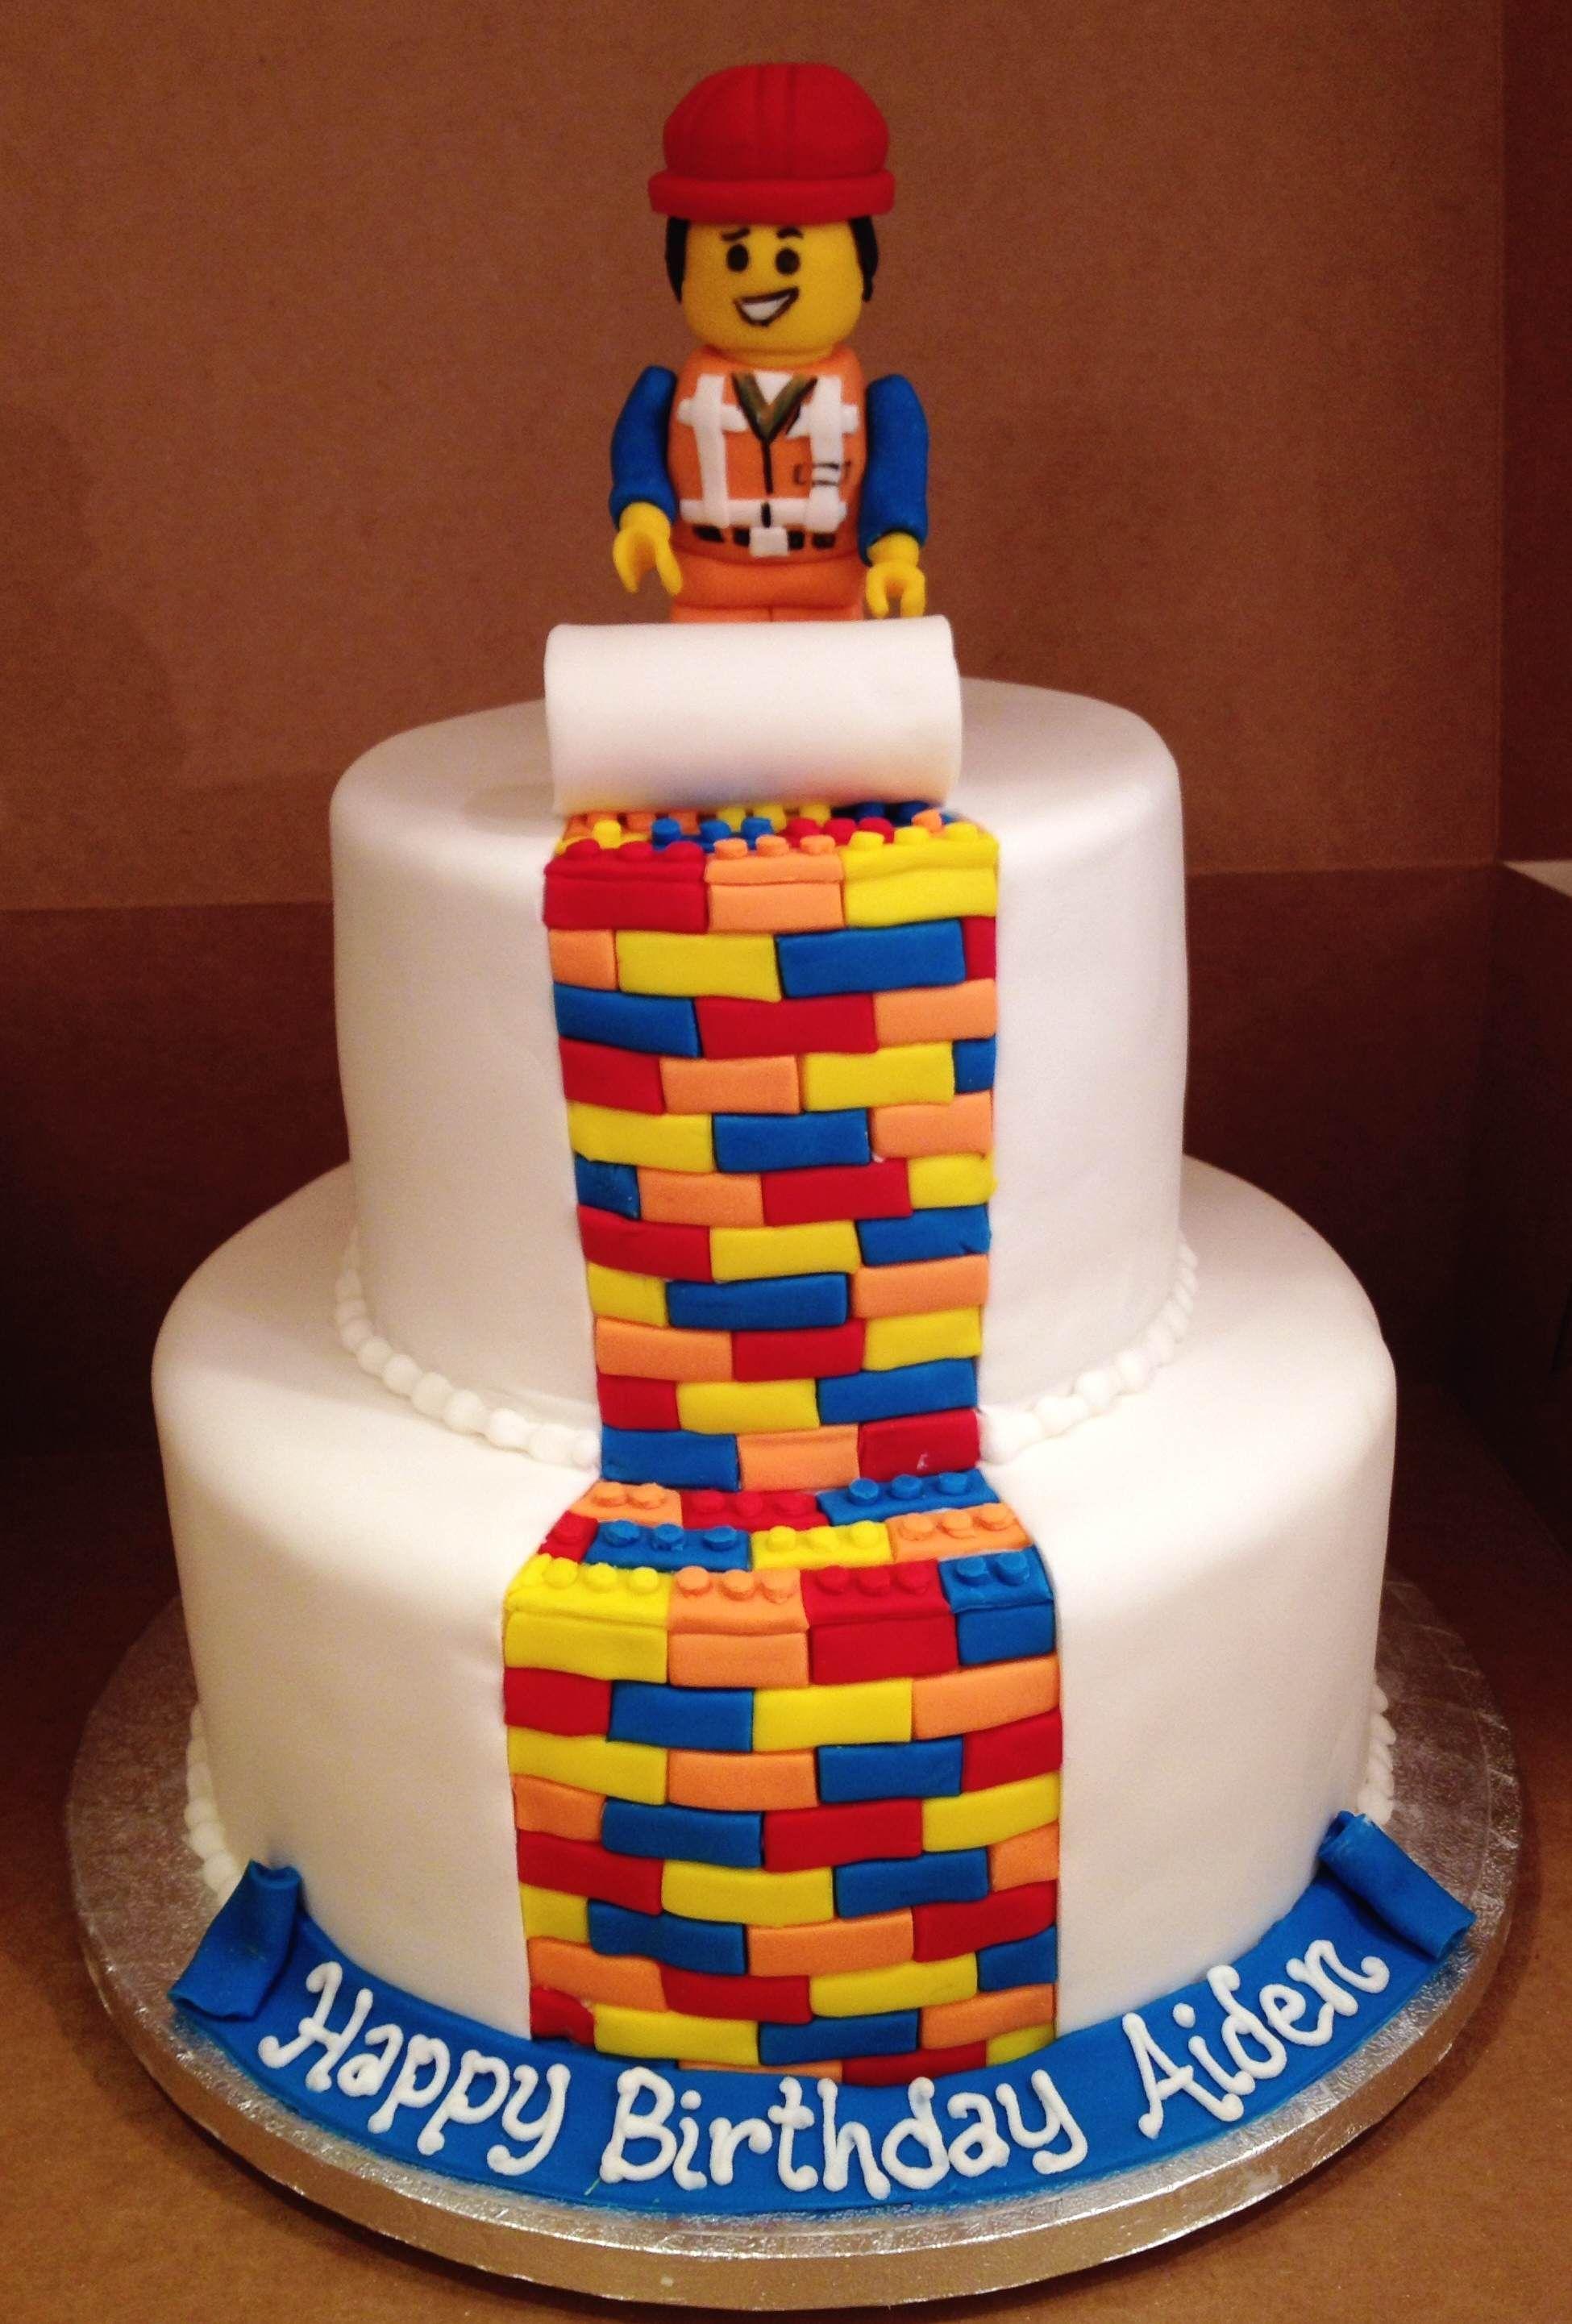 Awe Inspiring Lego Movie Themed Custom Birthday Cake Birthday Cake Kids Boys Funny Birthday Cards Online Fluifree Goldxyz